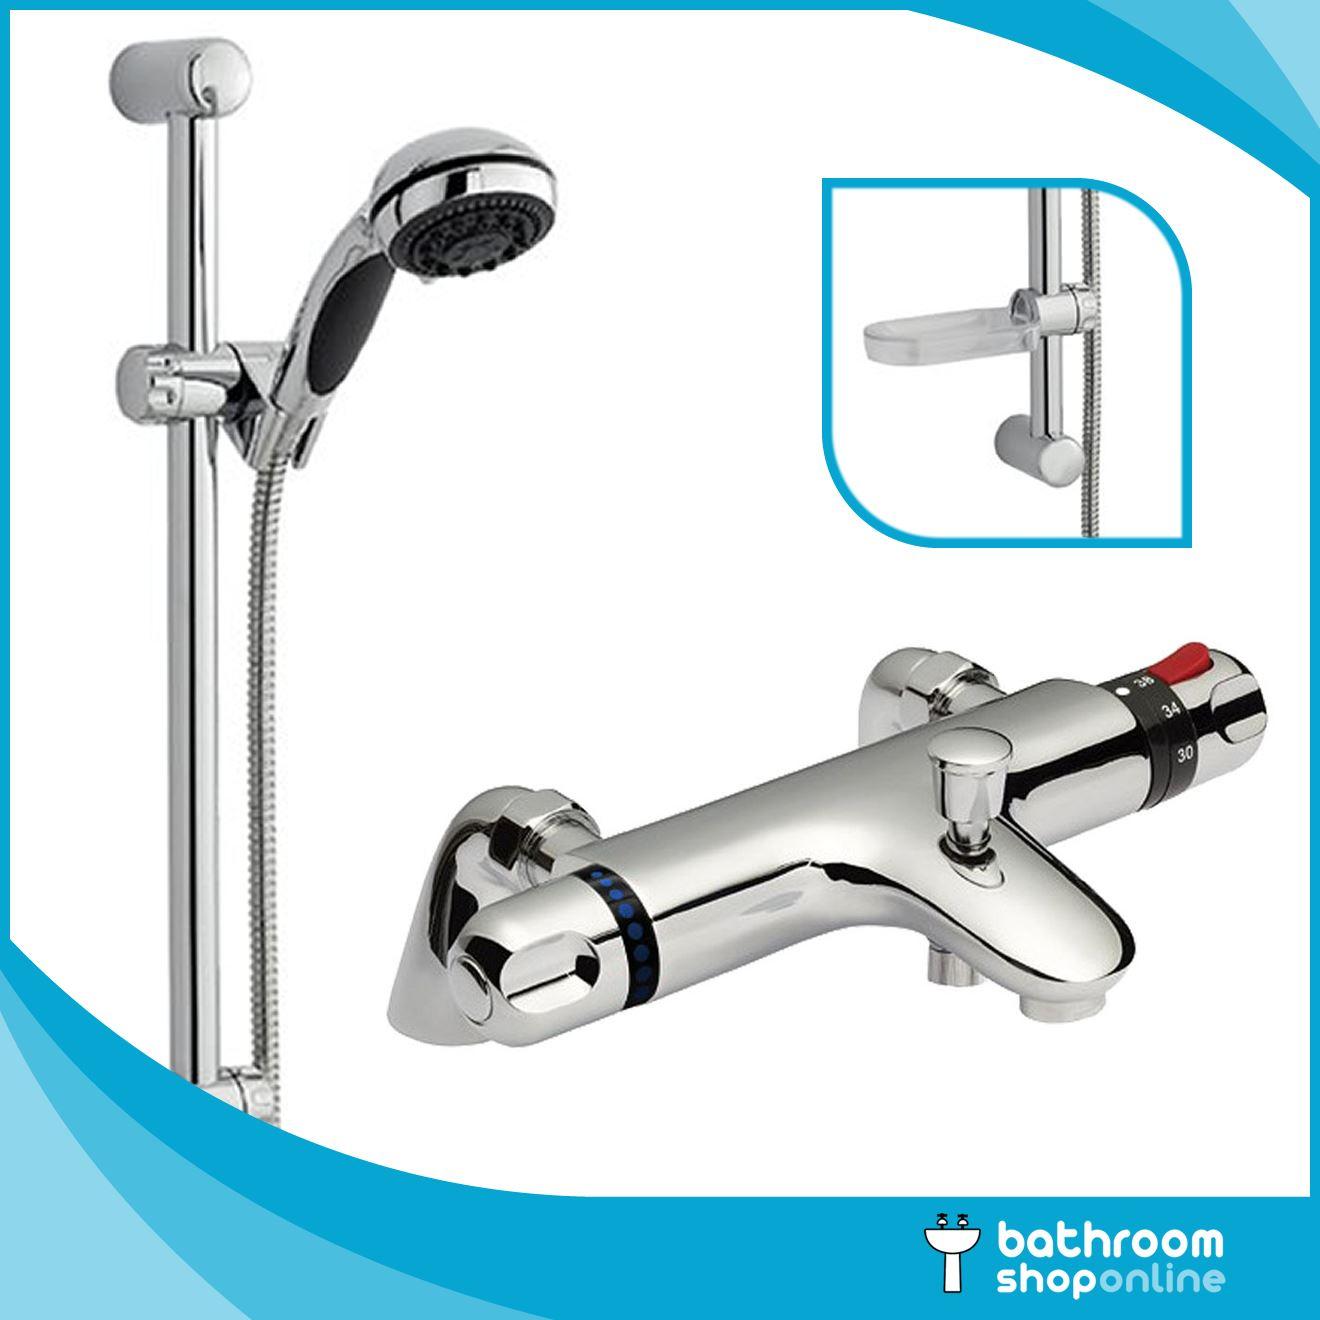 Wall Mounted Bath Shower Mixer Taps Thermostatic Bath Shower Mixer Tap Deck Or Wall Mounted